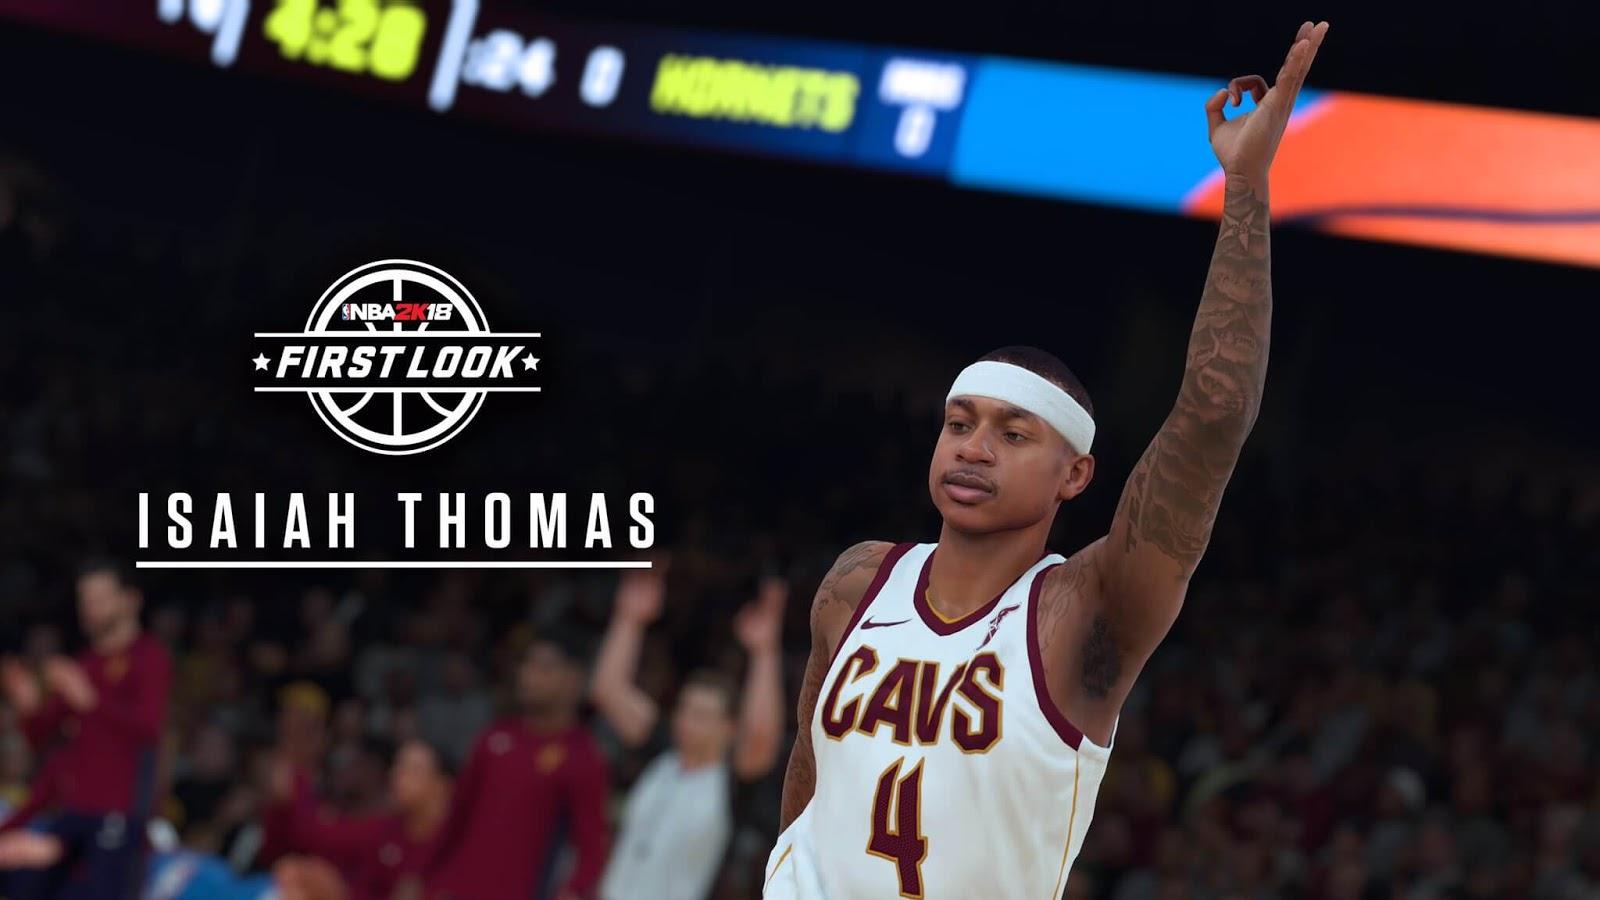 NBA 2k18 Isaiah Thomas Screenshot in Cavs